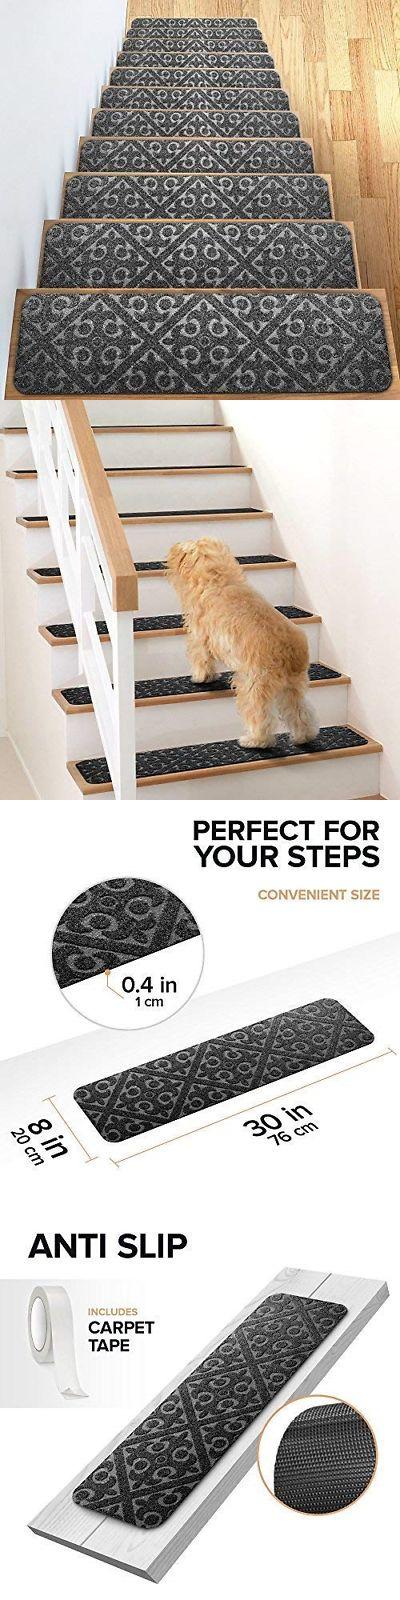 Best Stair Treads 175517 Elogio Carpet Stair Treads Set Of 13 400 x 300